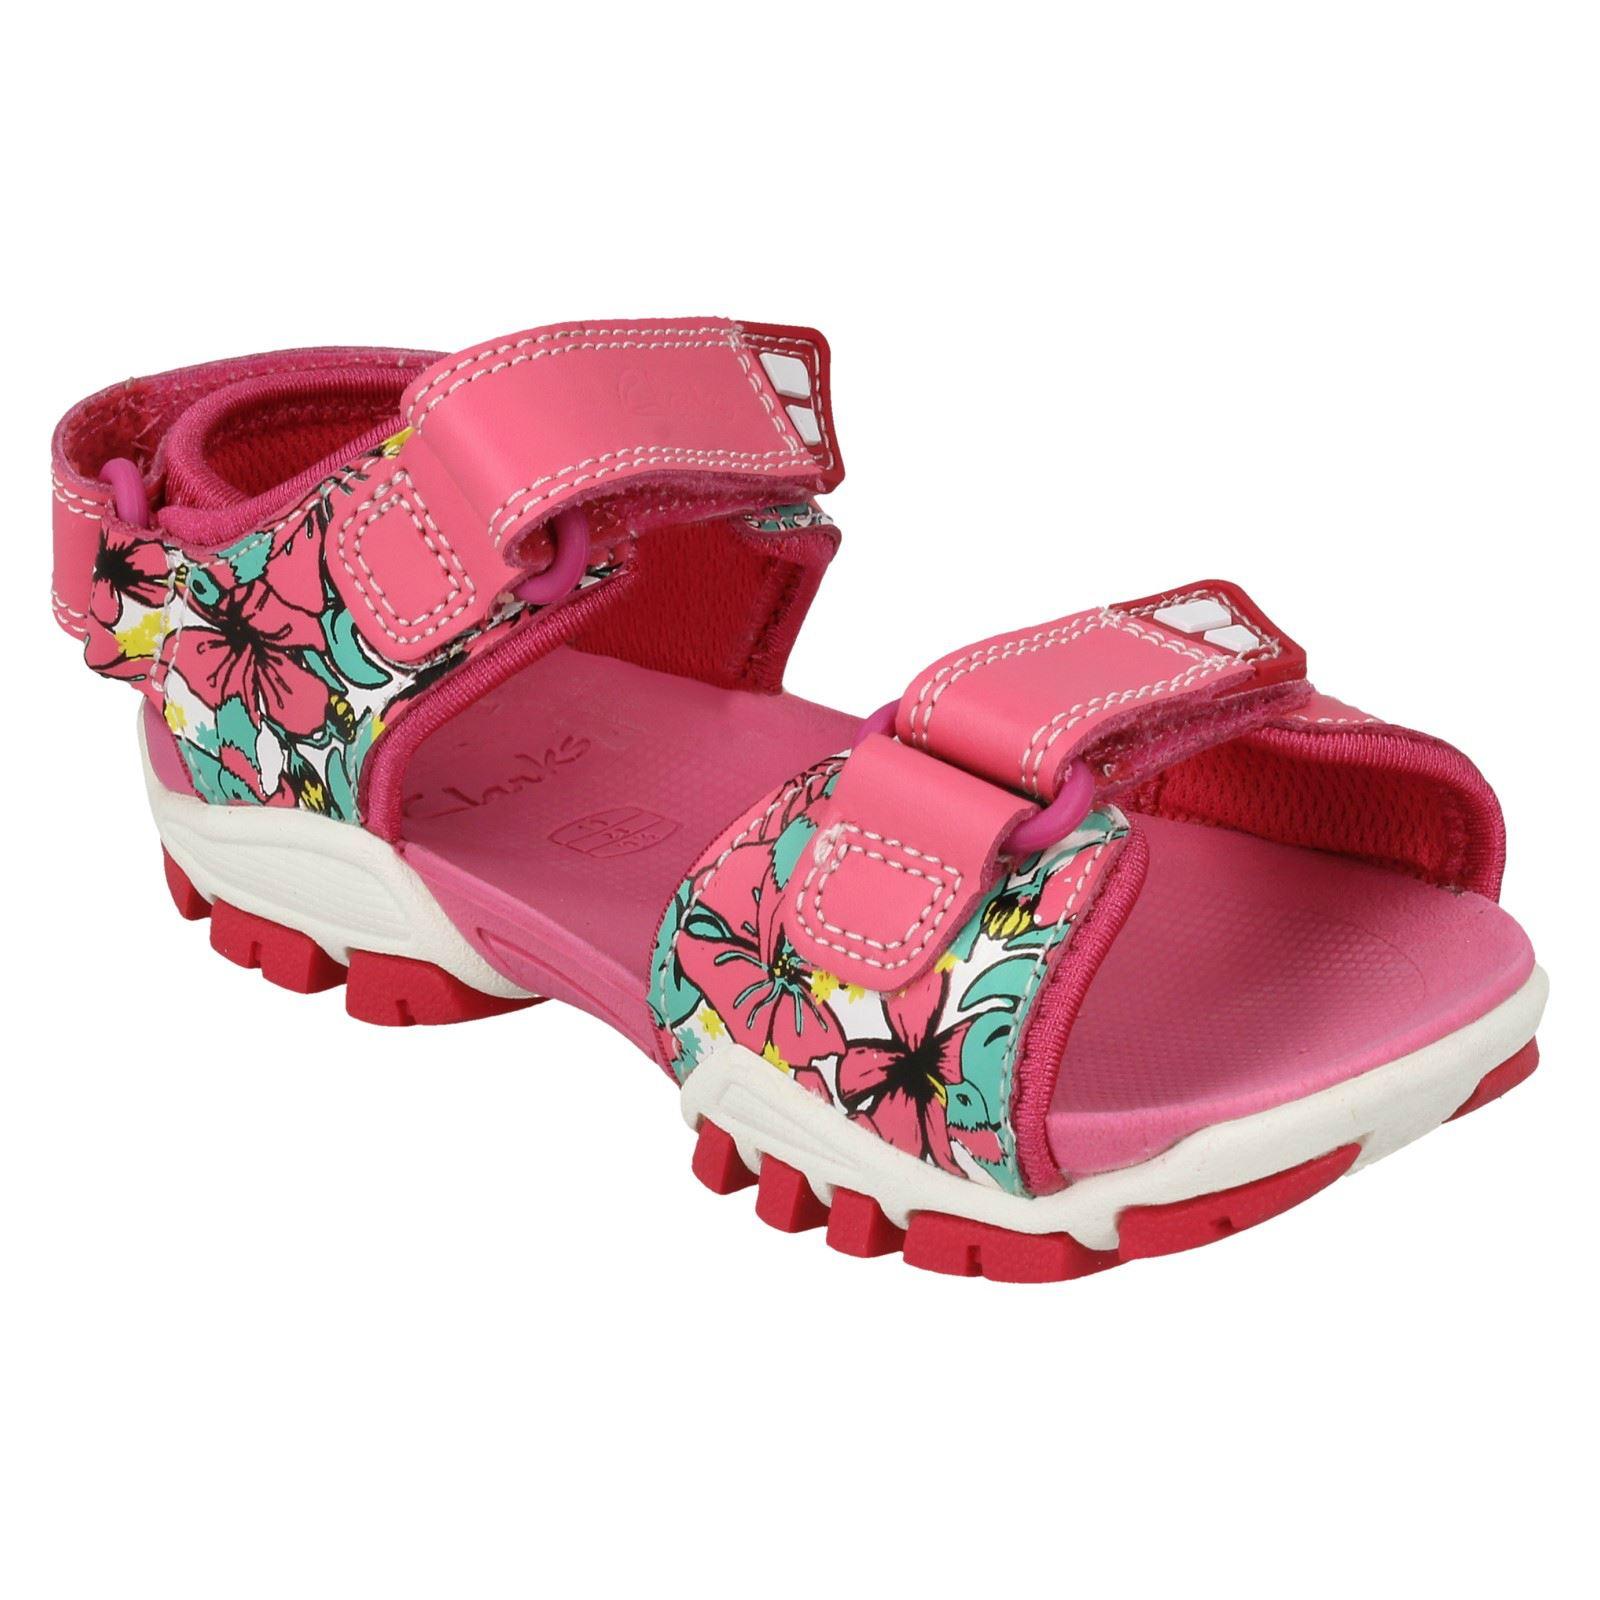 Girls Clarks Water-Friendly Sandals /'Zalmo Word/'